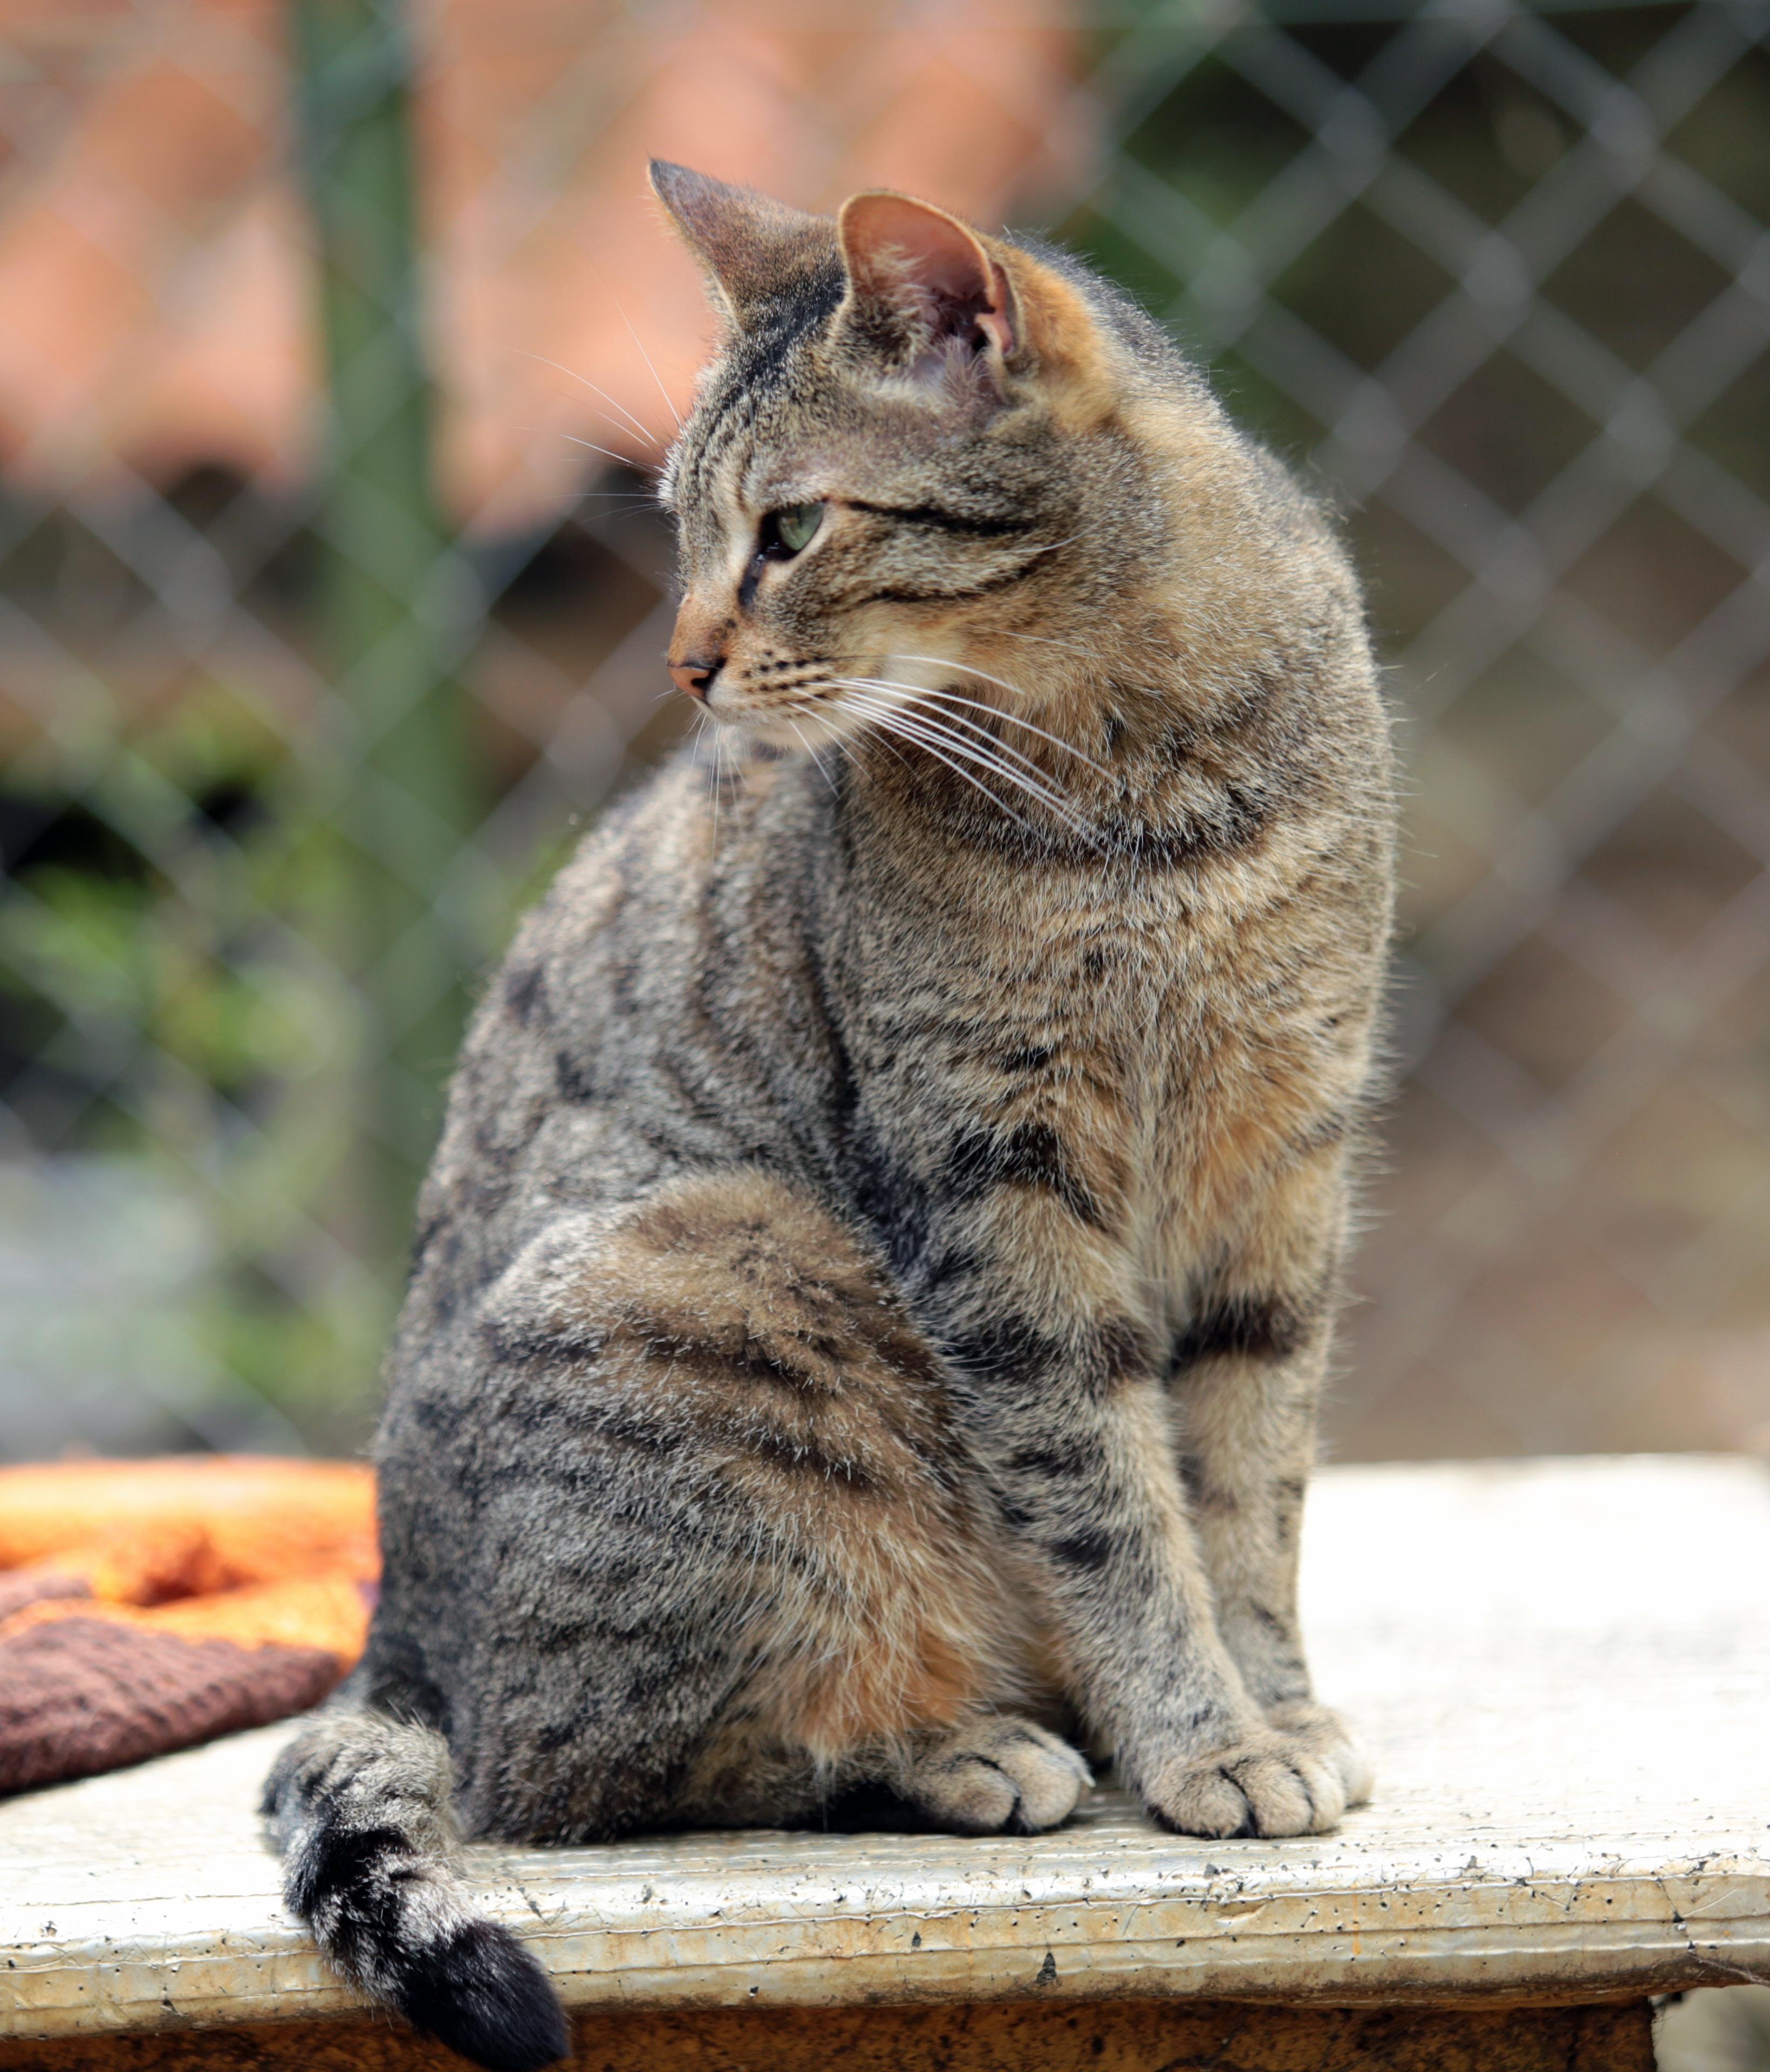 Gambar Licik Kucing Betina Binatang Menyusui Fauna